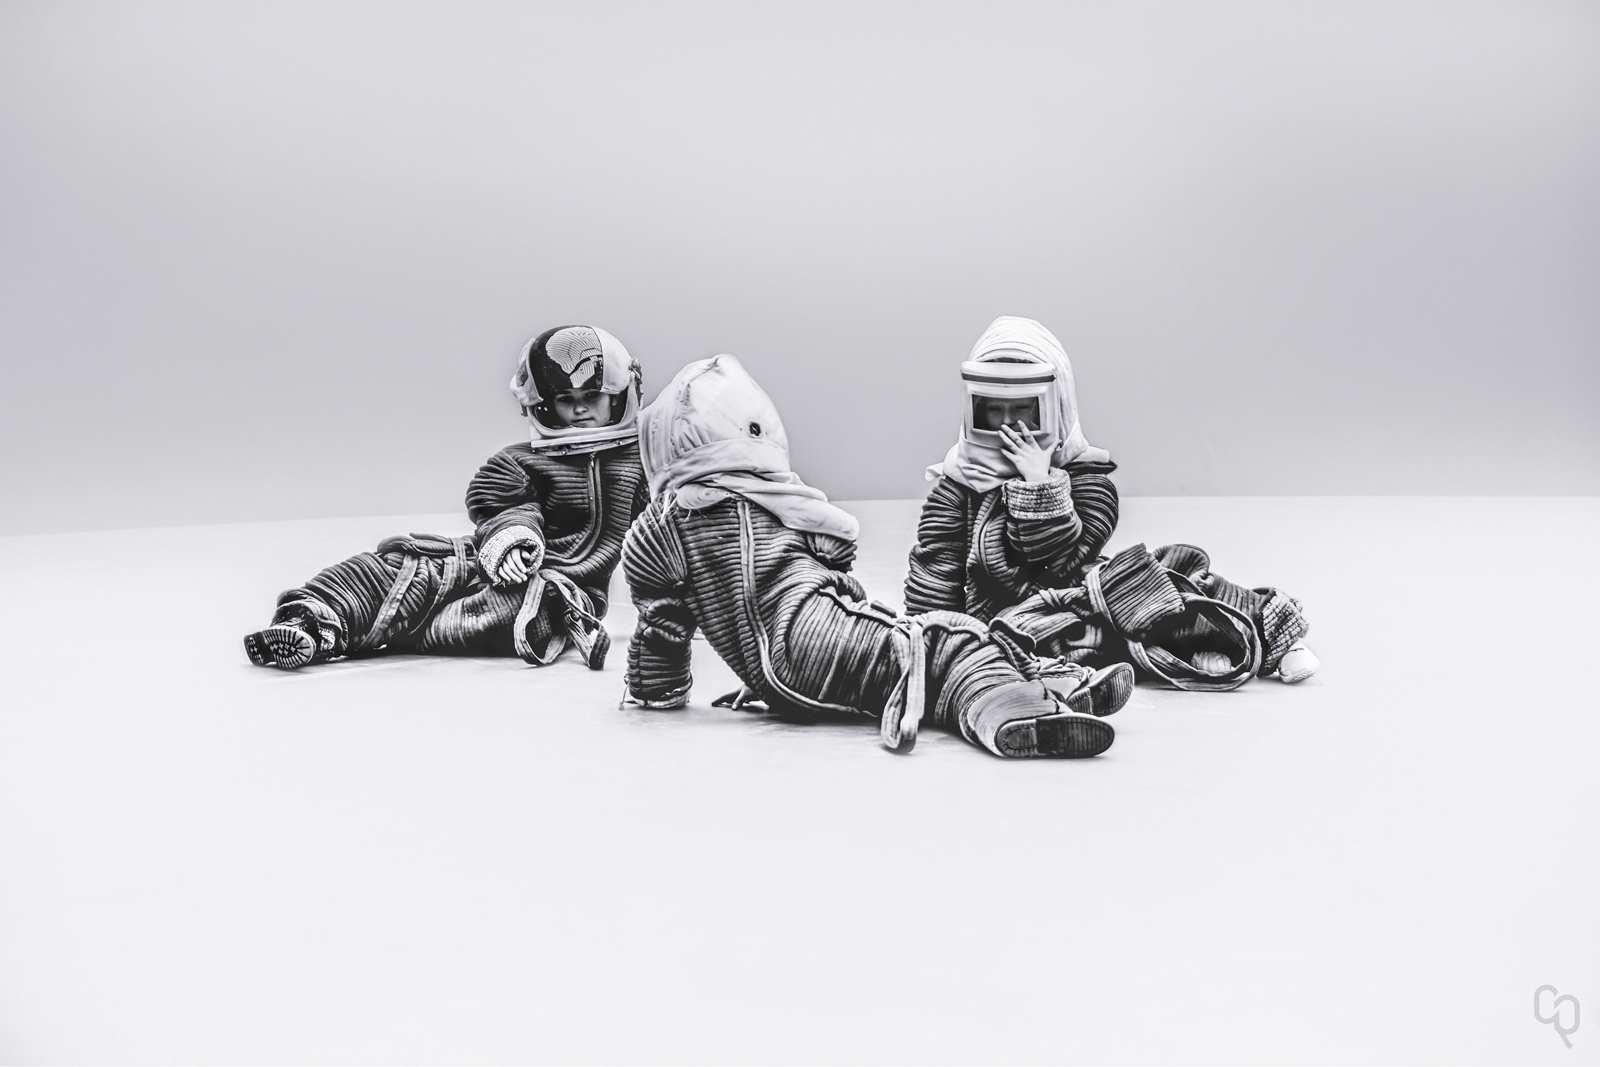 Blank Space: Black and White Astronaut Portraits by Robert Cybulski